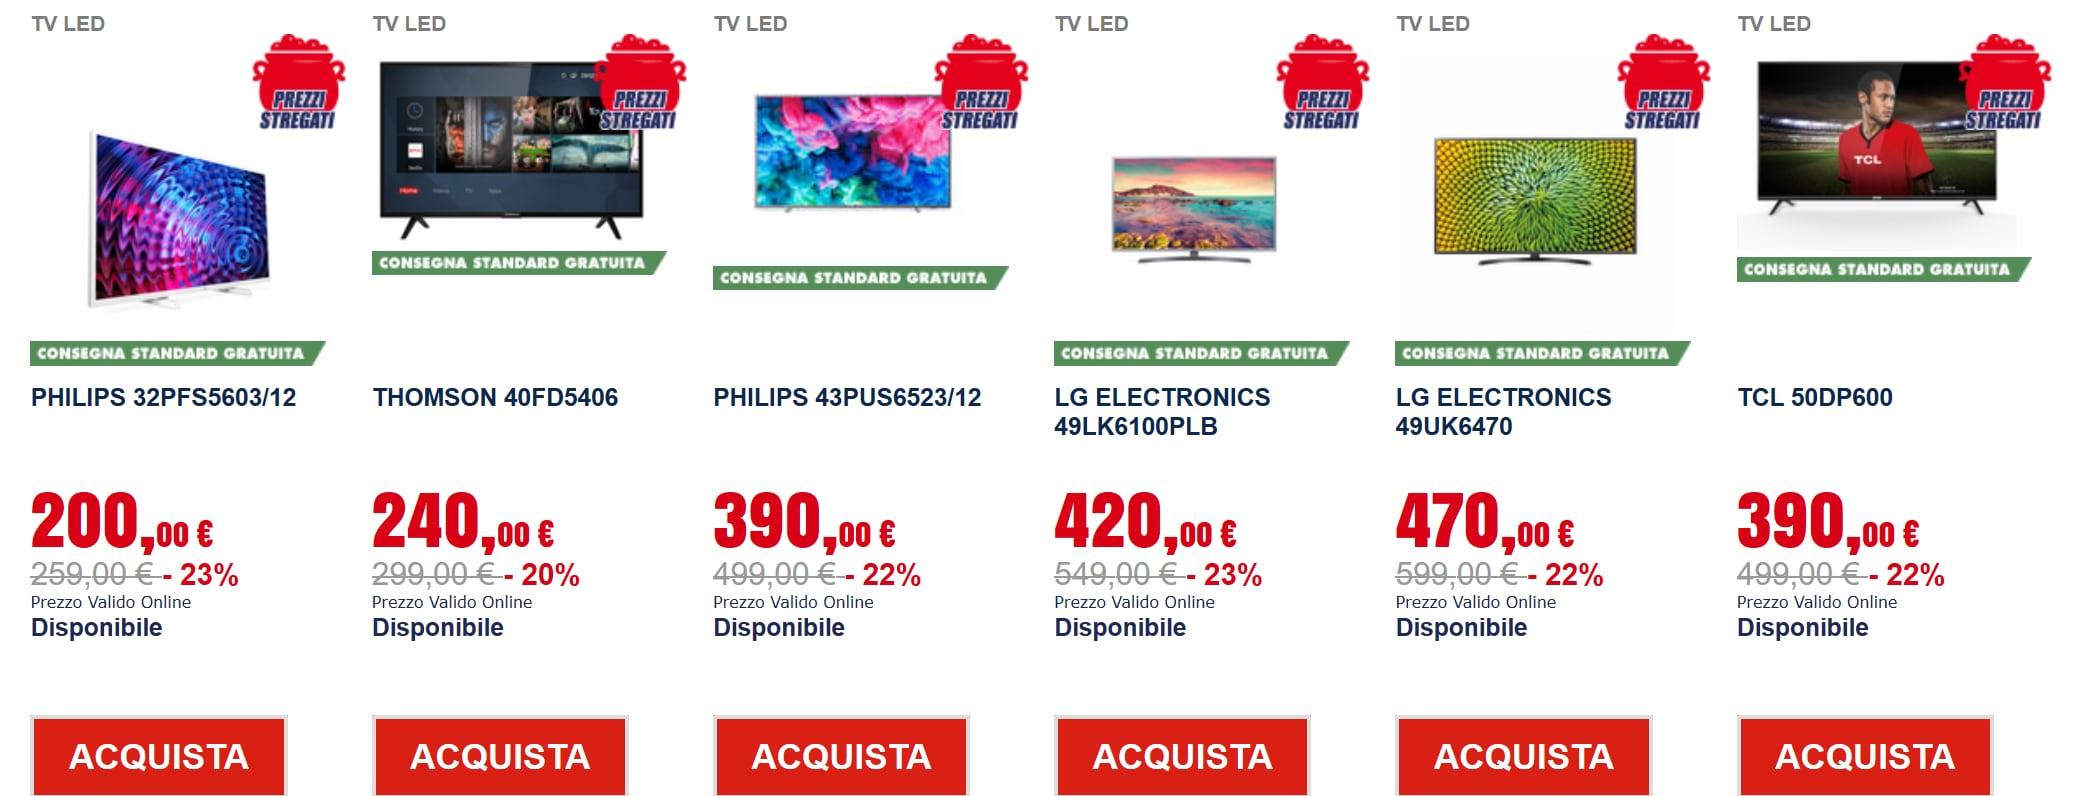 trony prezzi tappeto novembre 2018 tv (3)